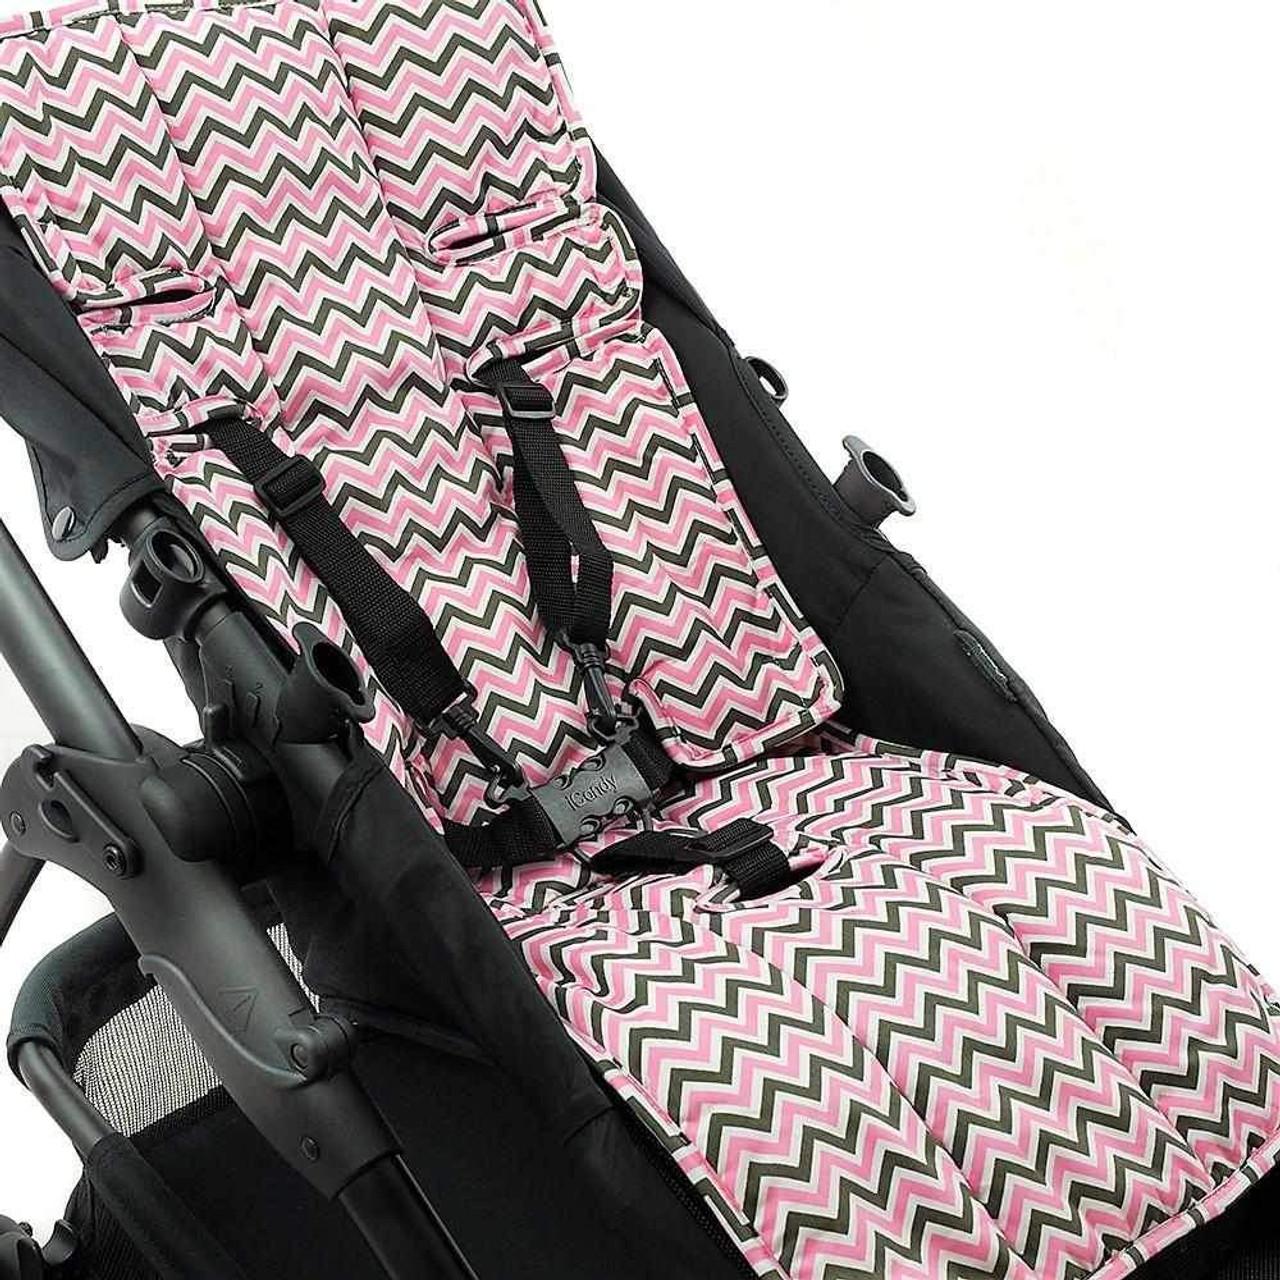 Outlook 100% Cotton Pram Liner - Charcoal/ Pink Chevron